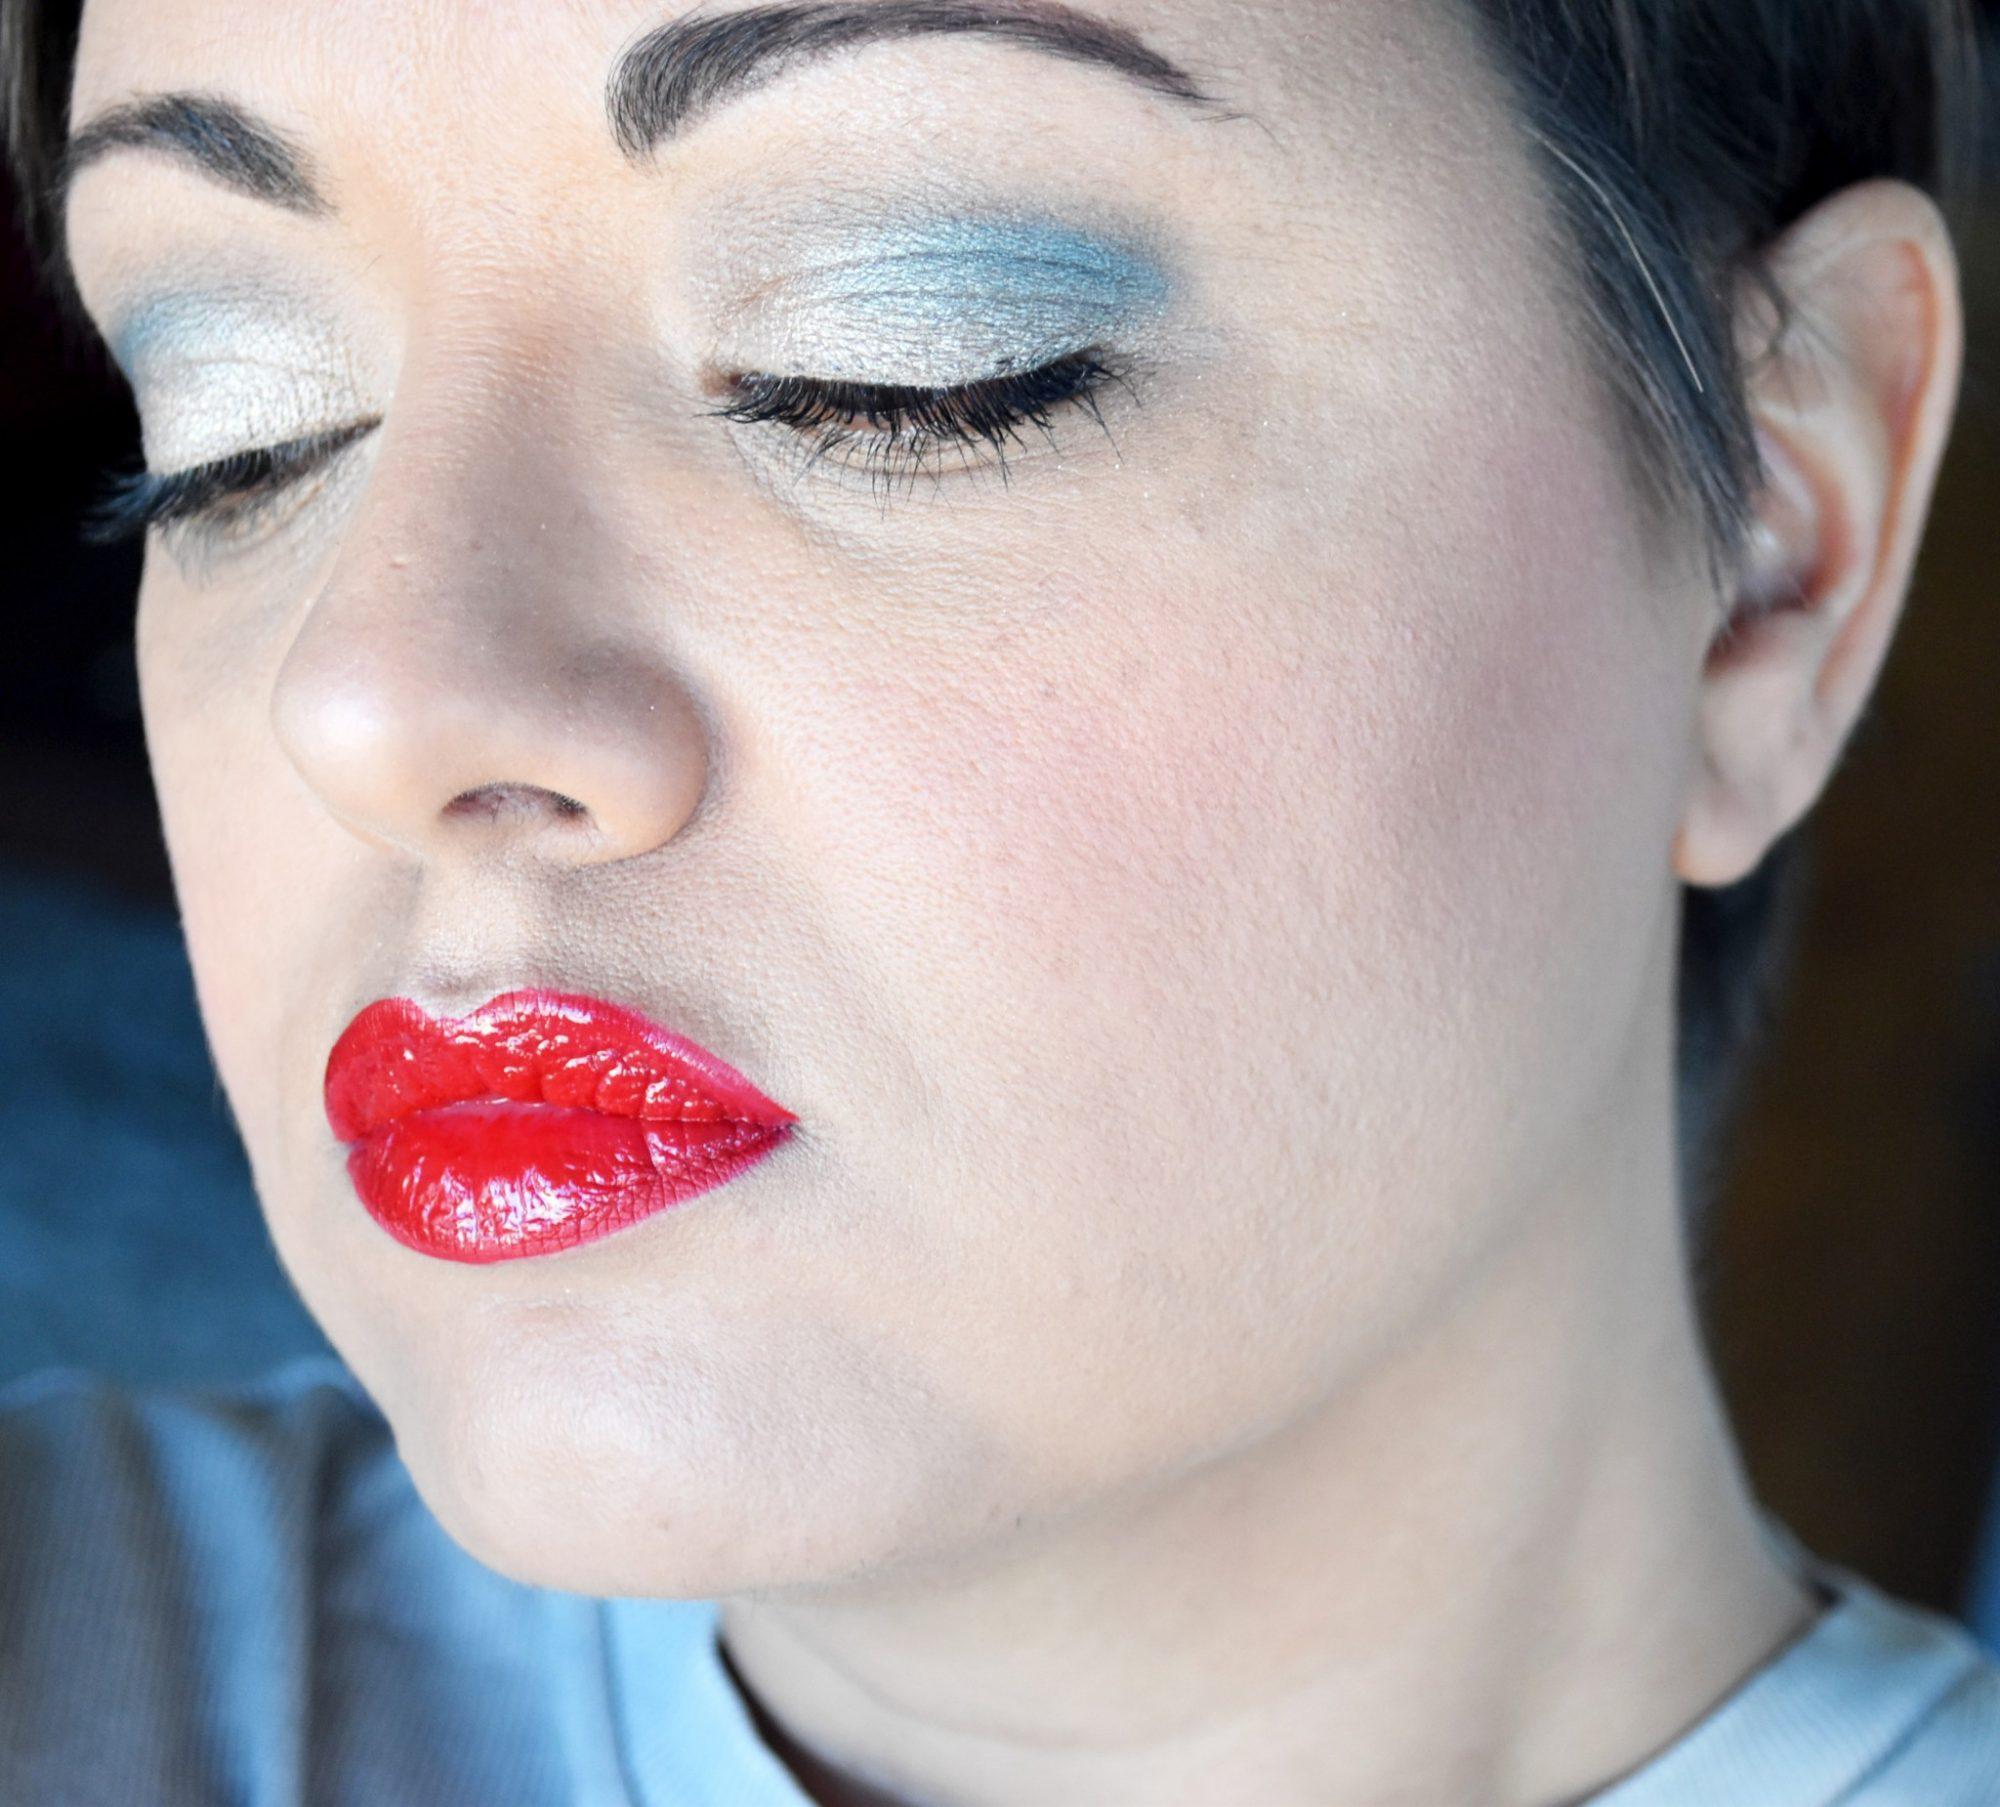 Recension: 4-in-1 Lip Duo från Pür Cosmetics